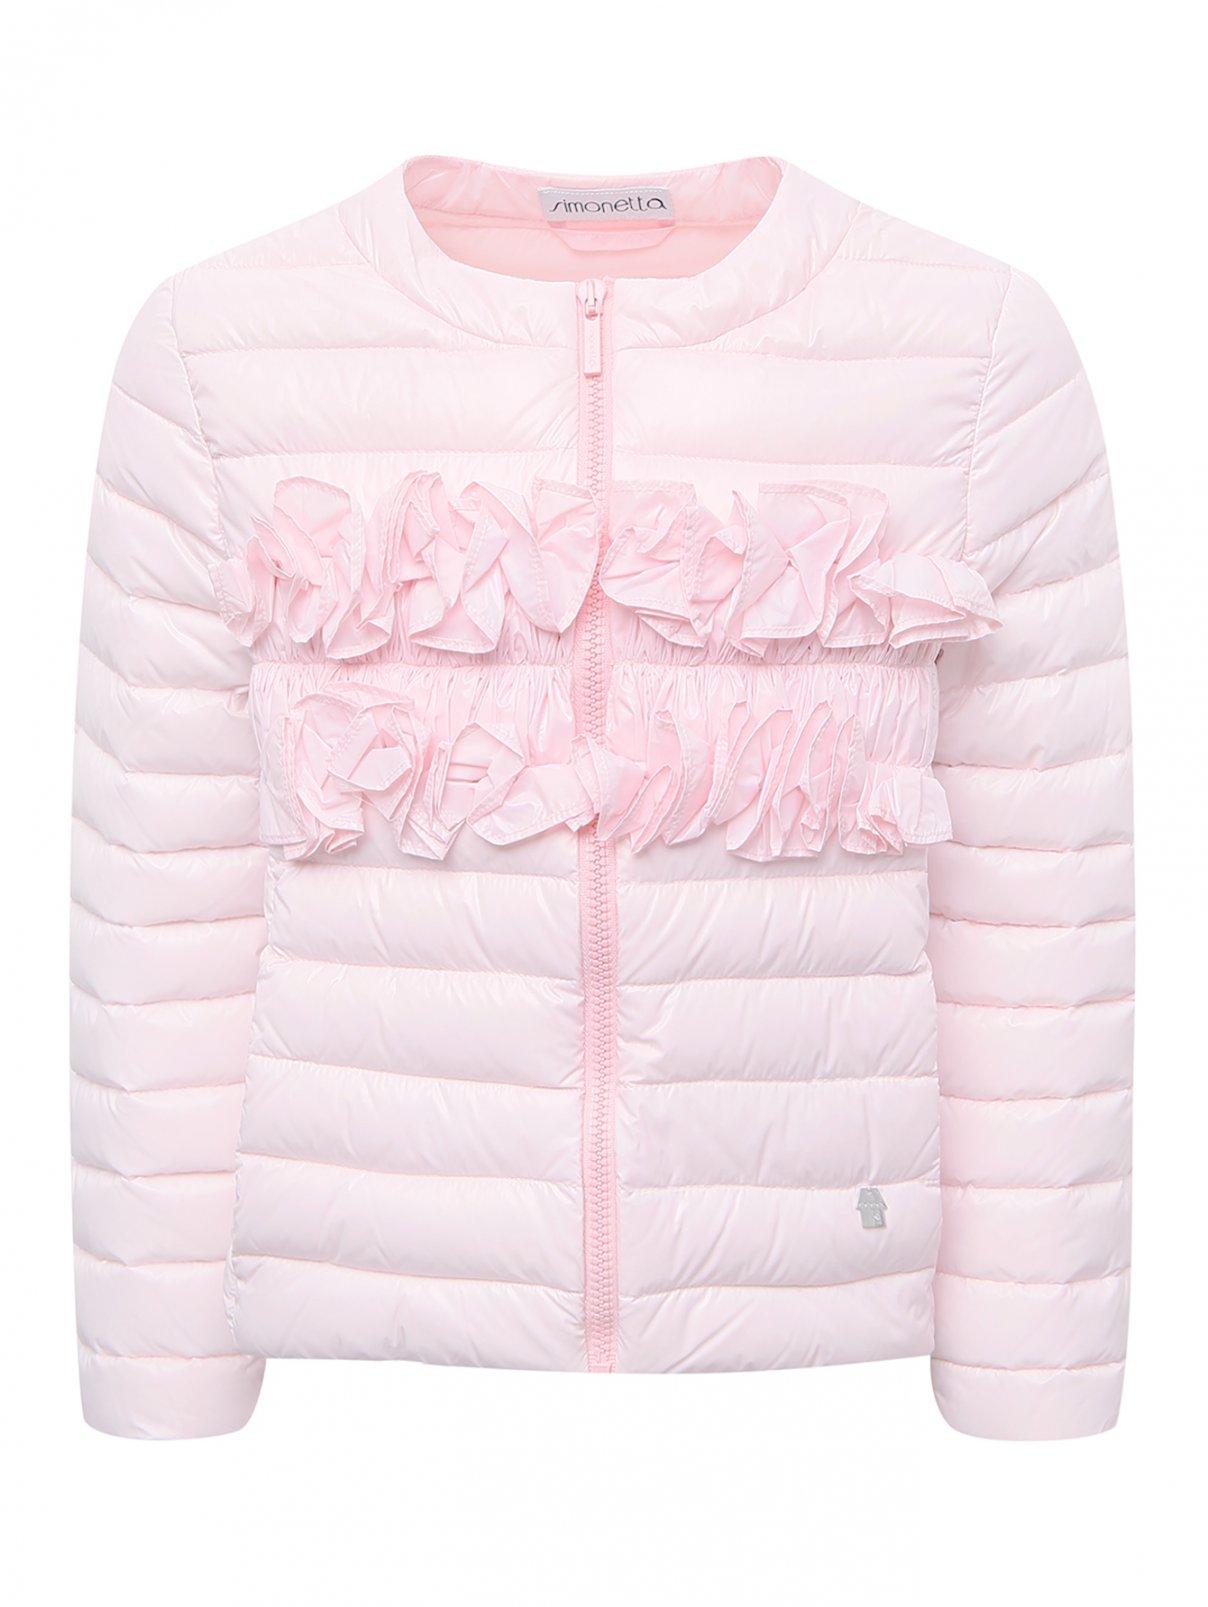 Куртка демисезонная с декором Simonetta  –  Общий вид